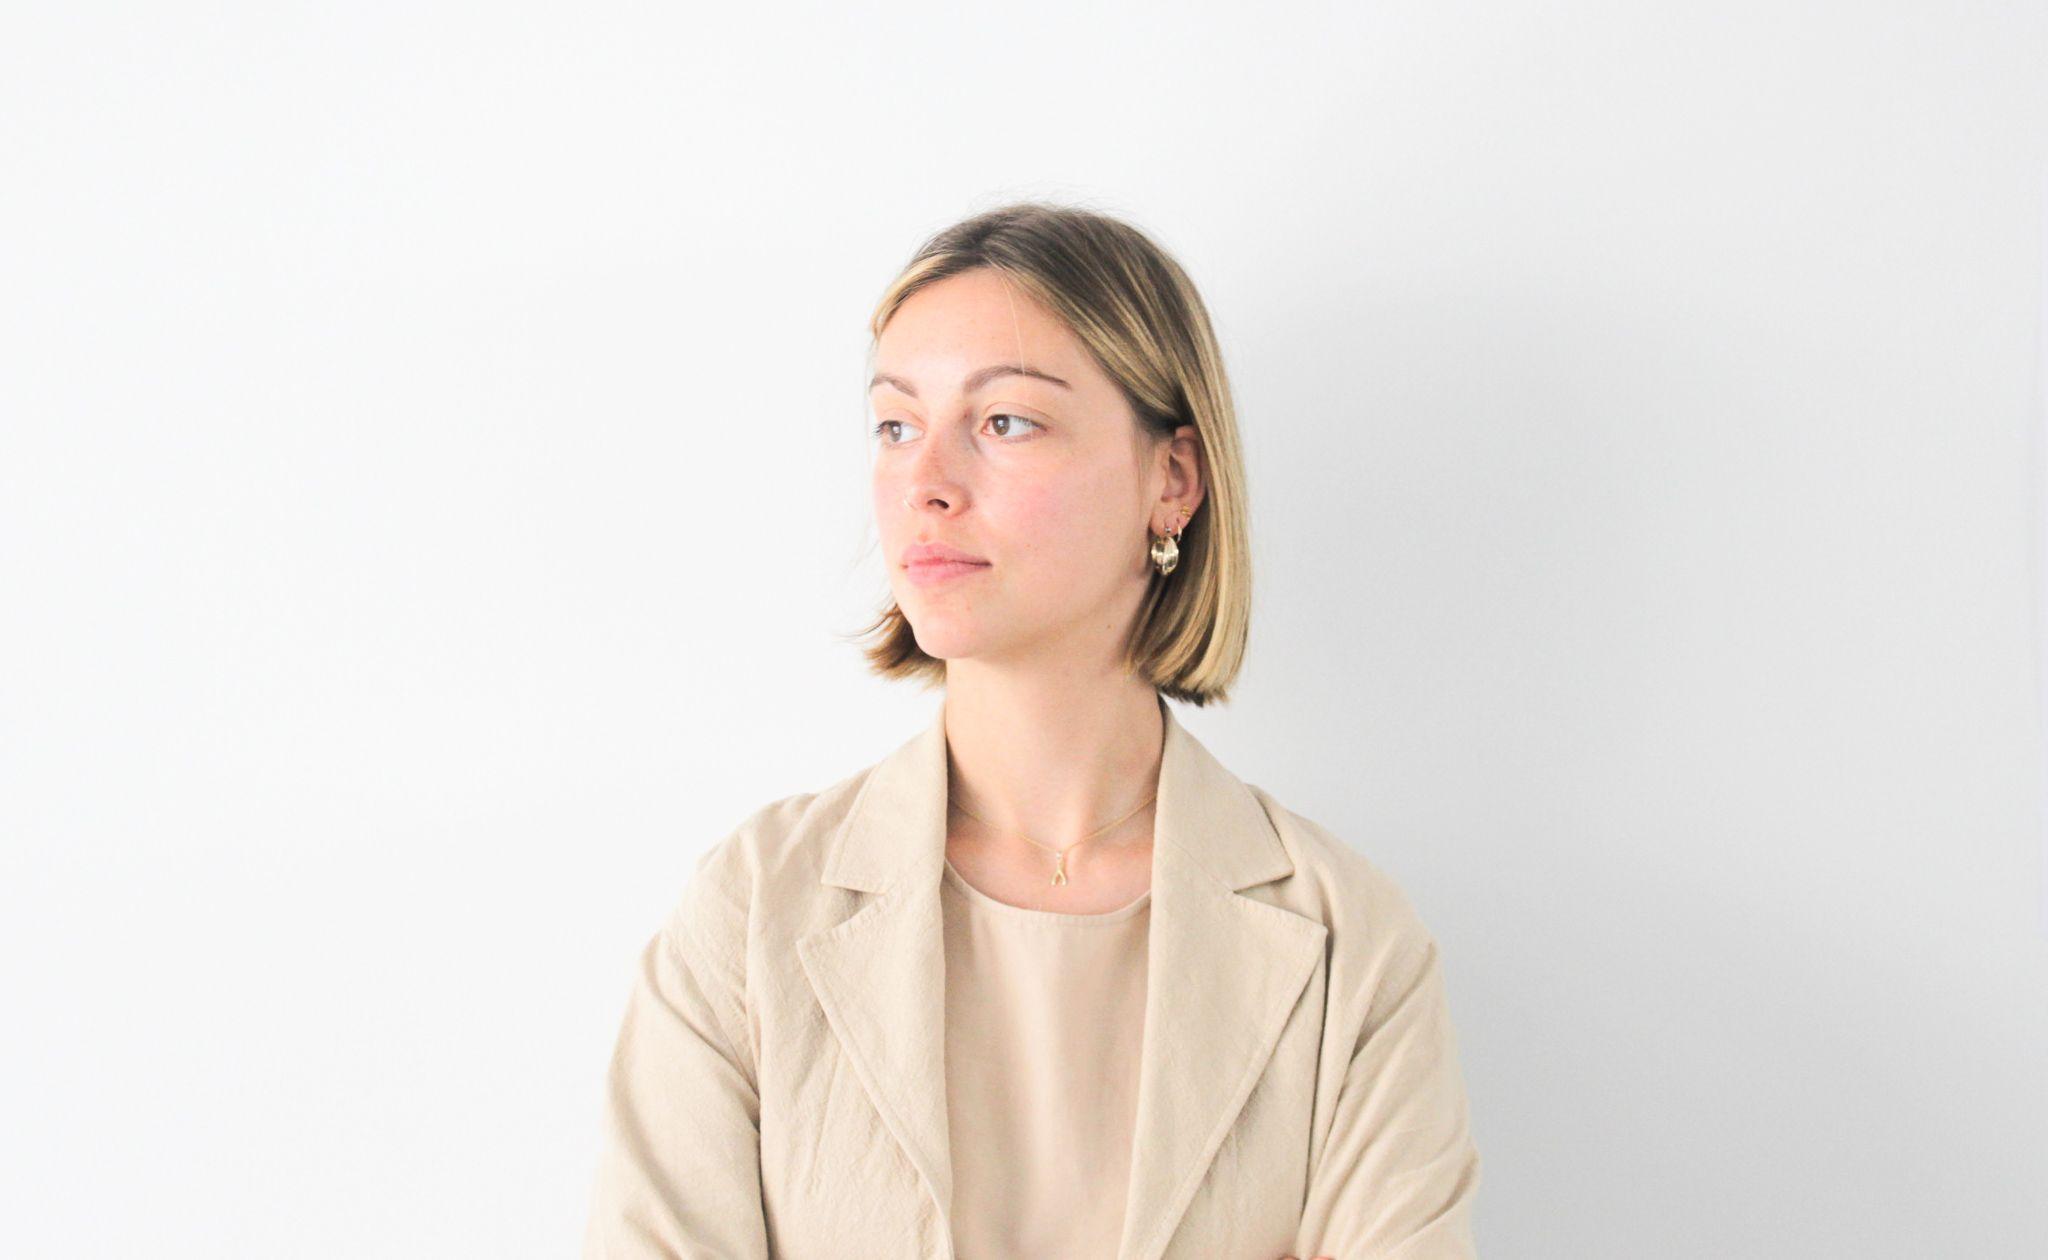 Bothive | Lauren Quataert